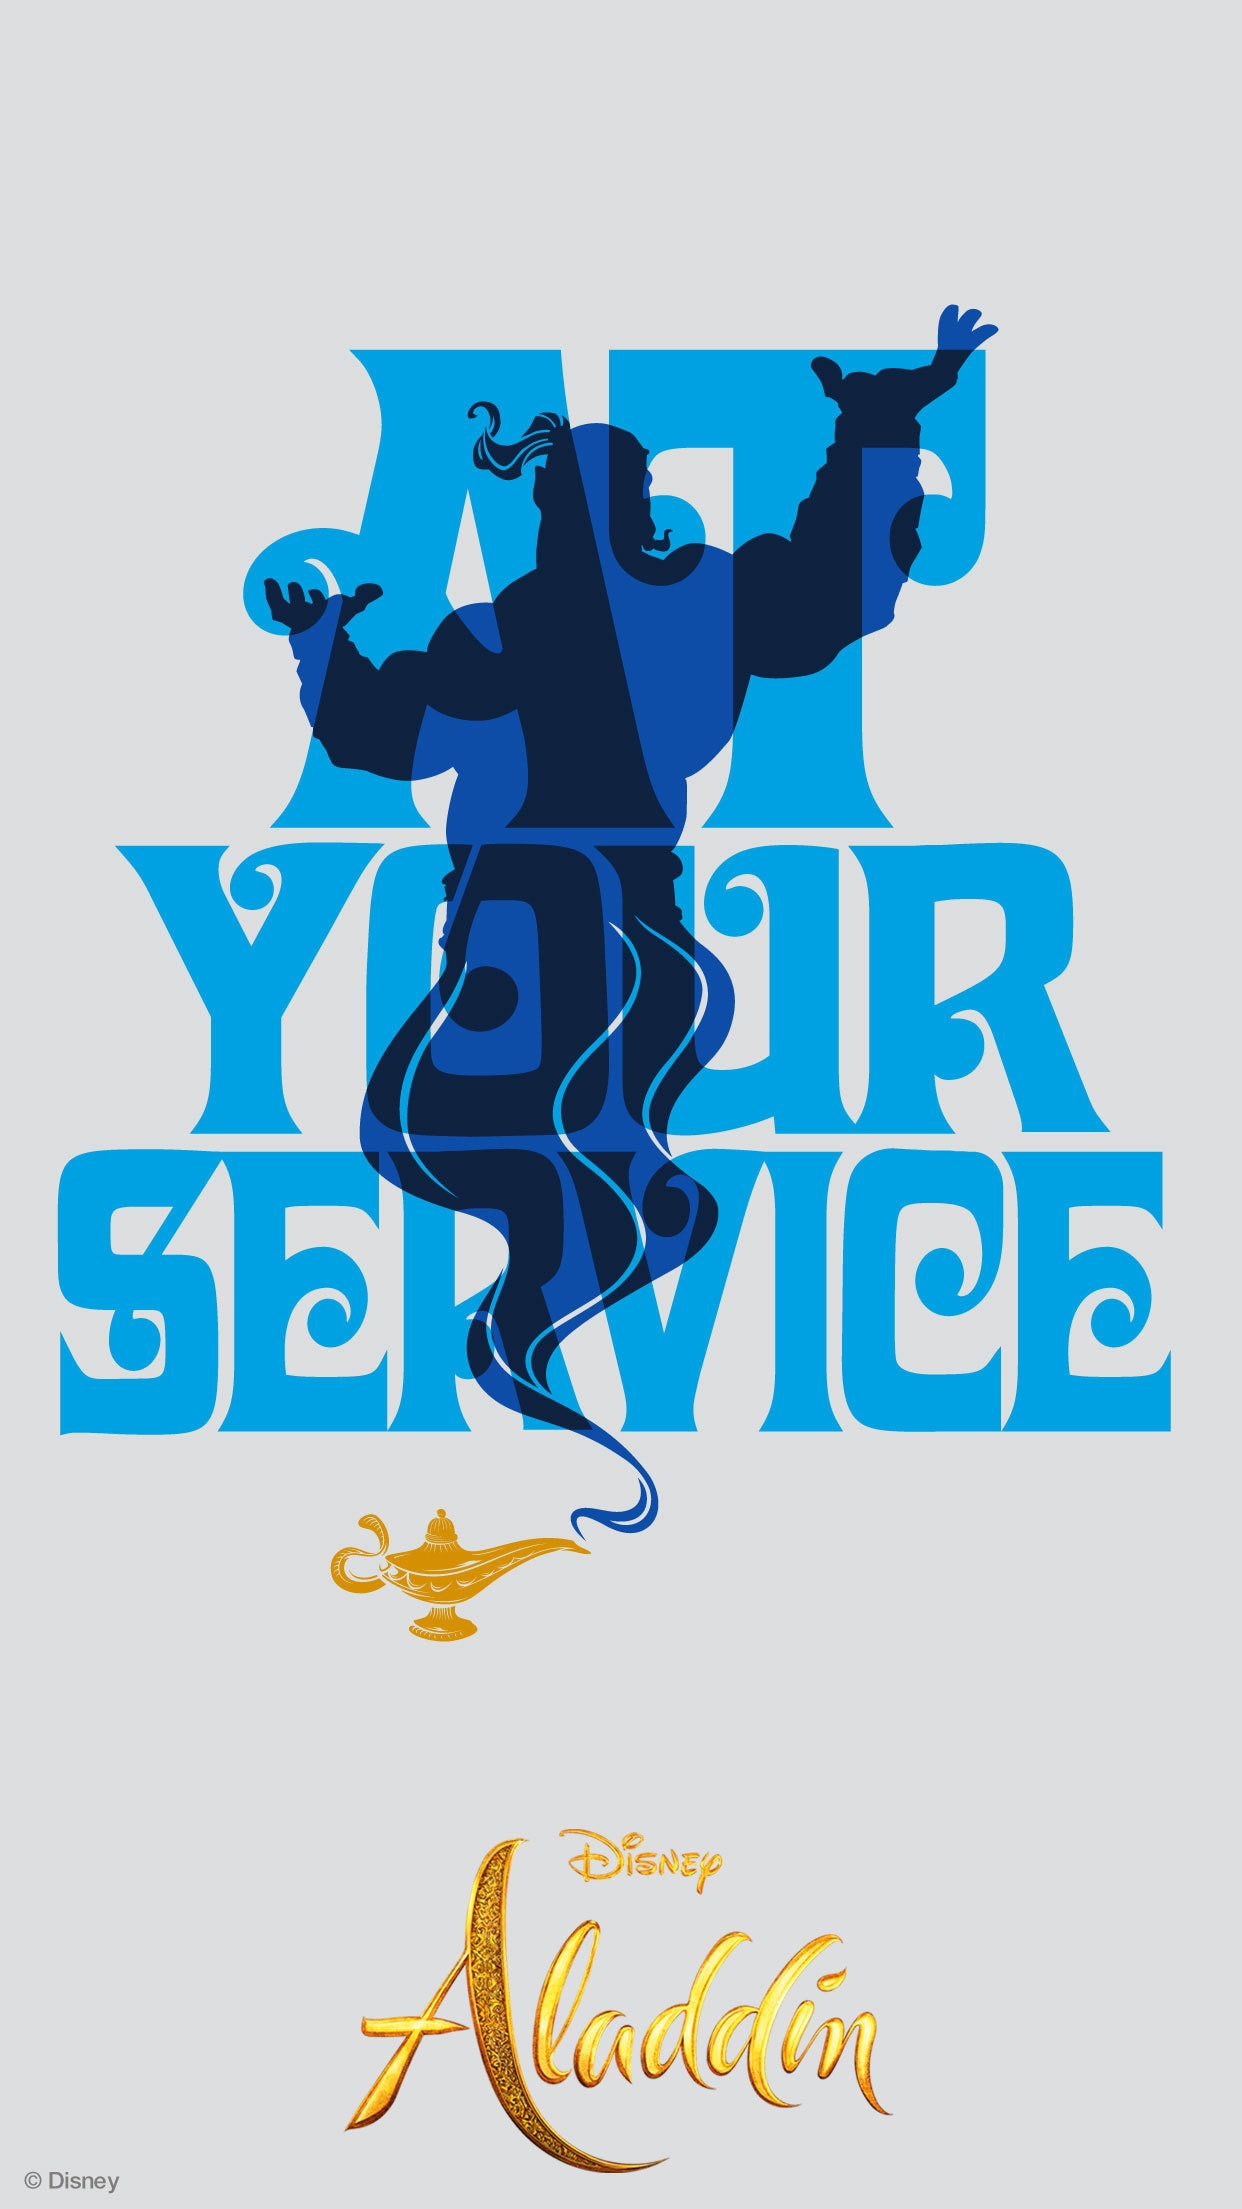 Aladdin Mobile Wallpapers Disney Singapore